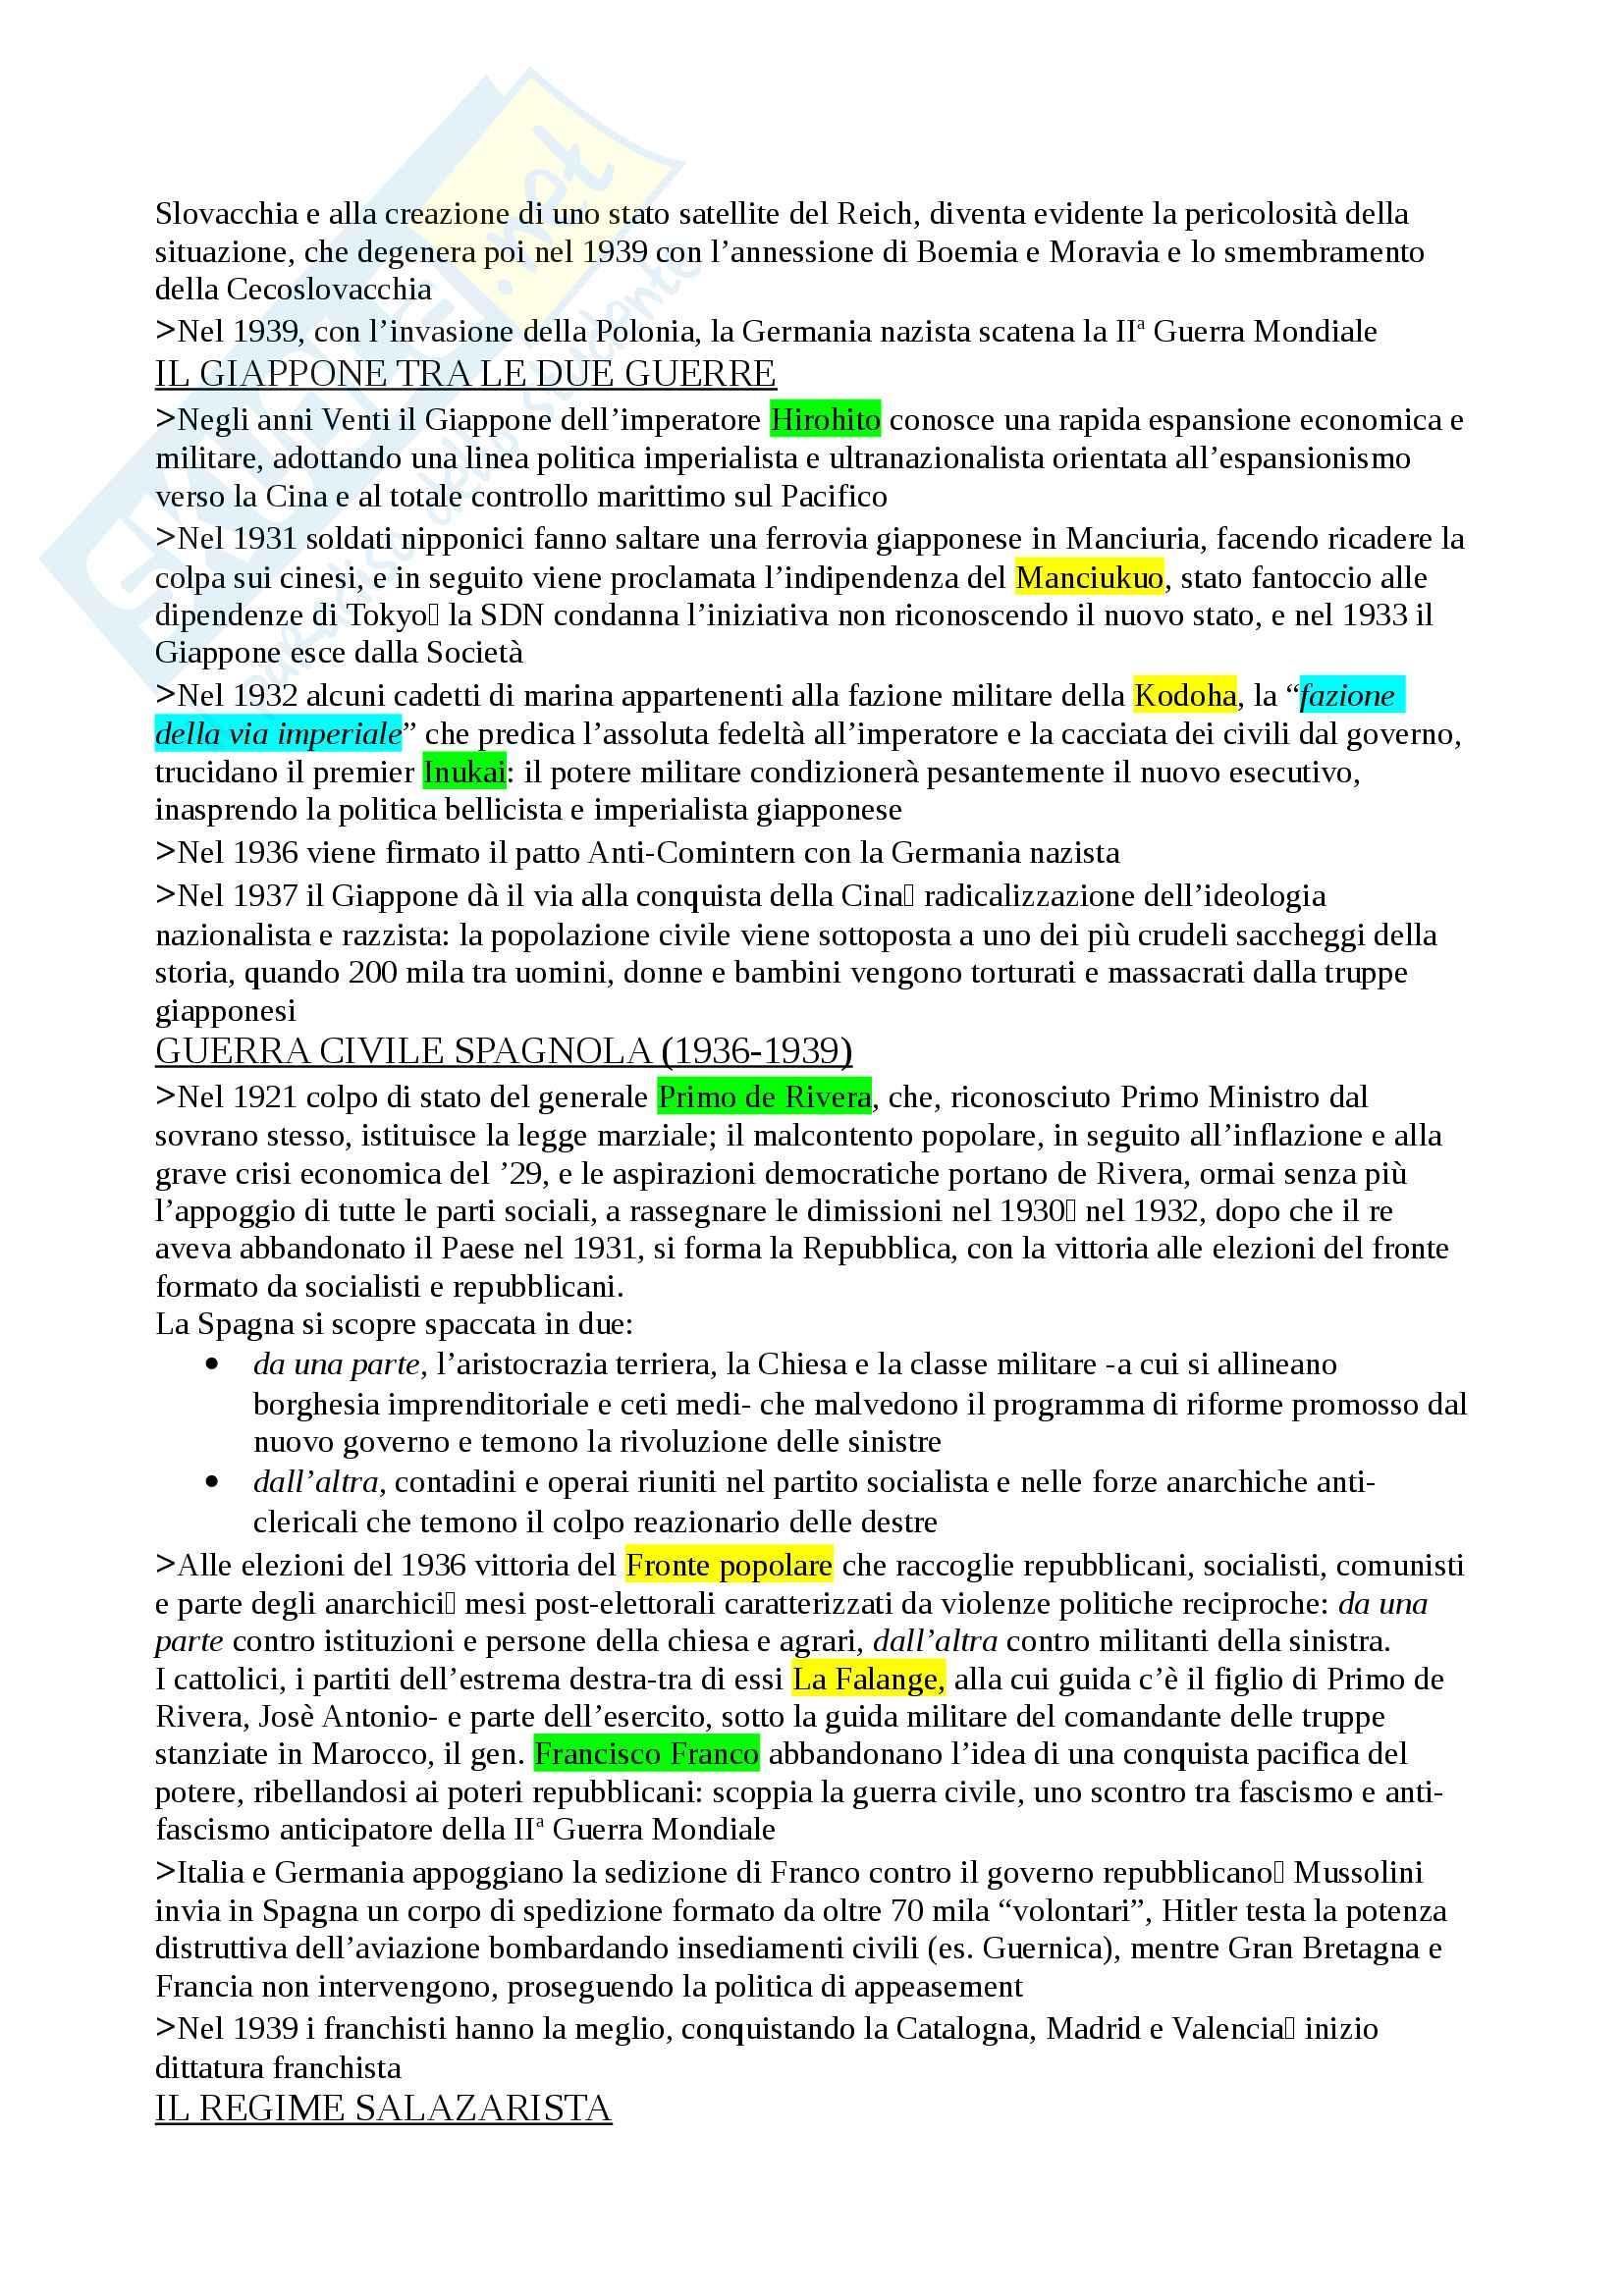 Cuzzi Storia contemporanea Pag. 16